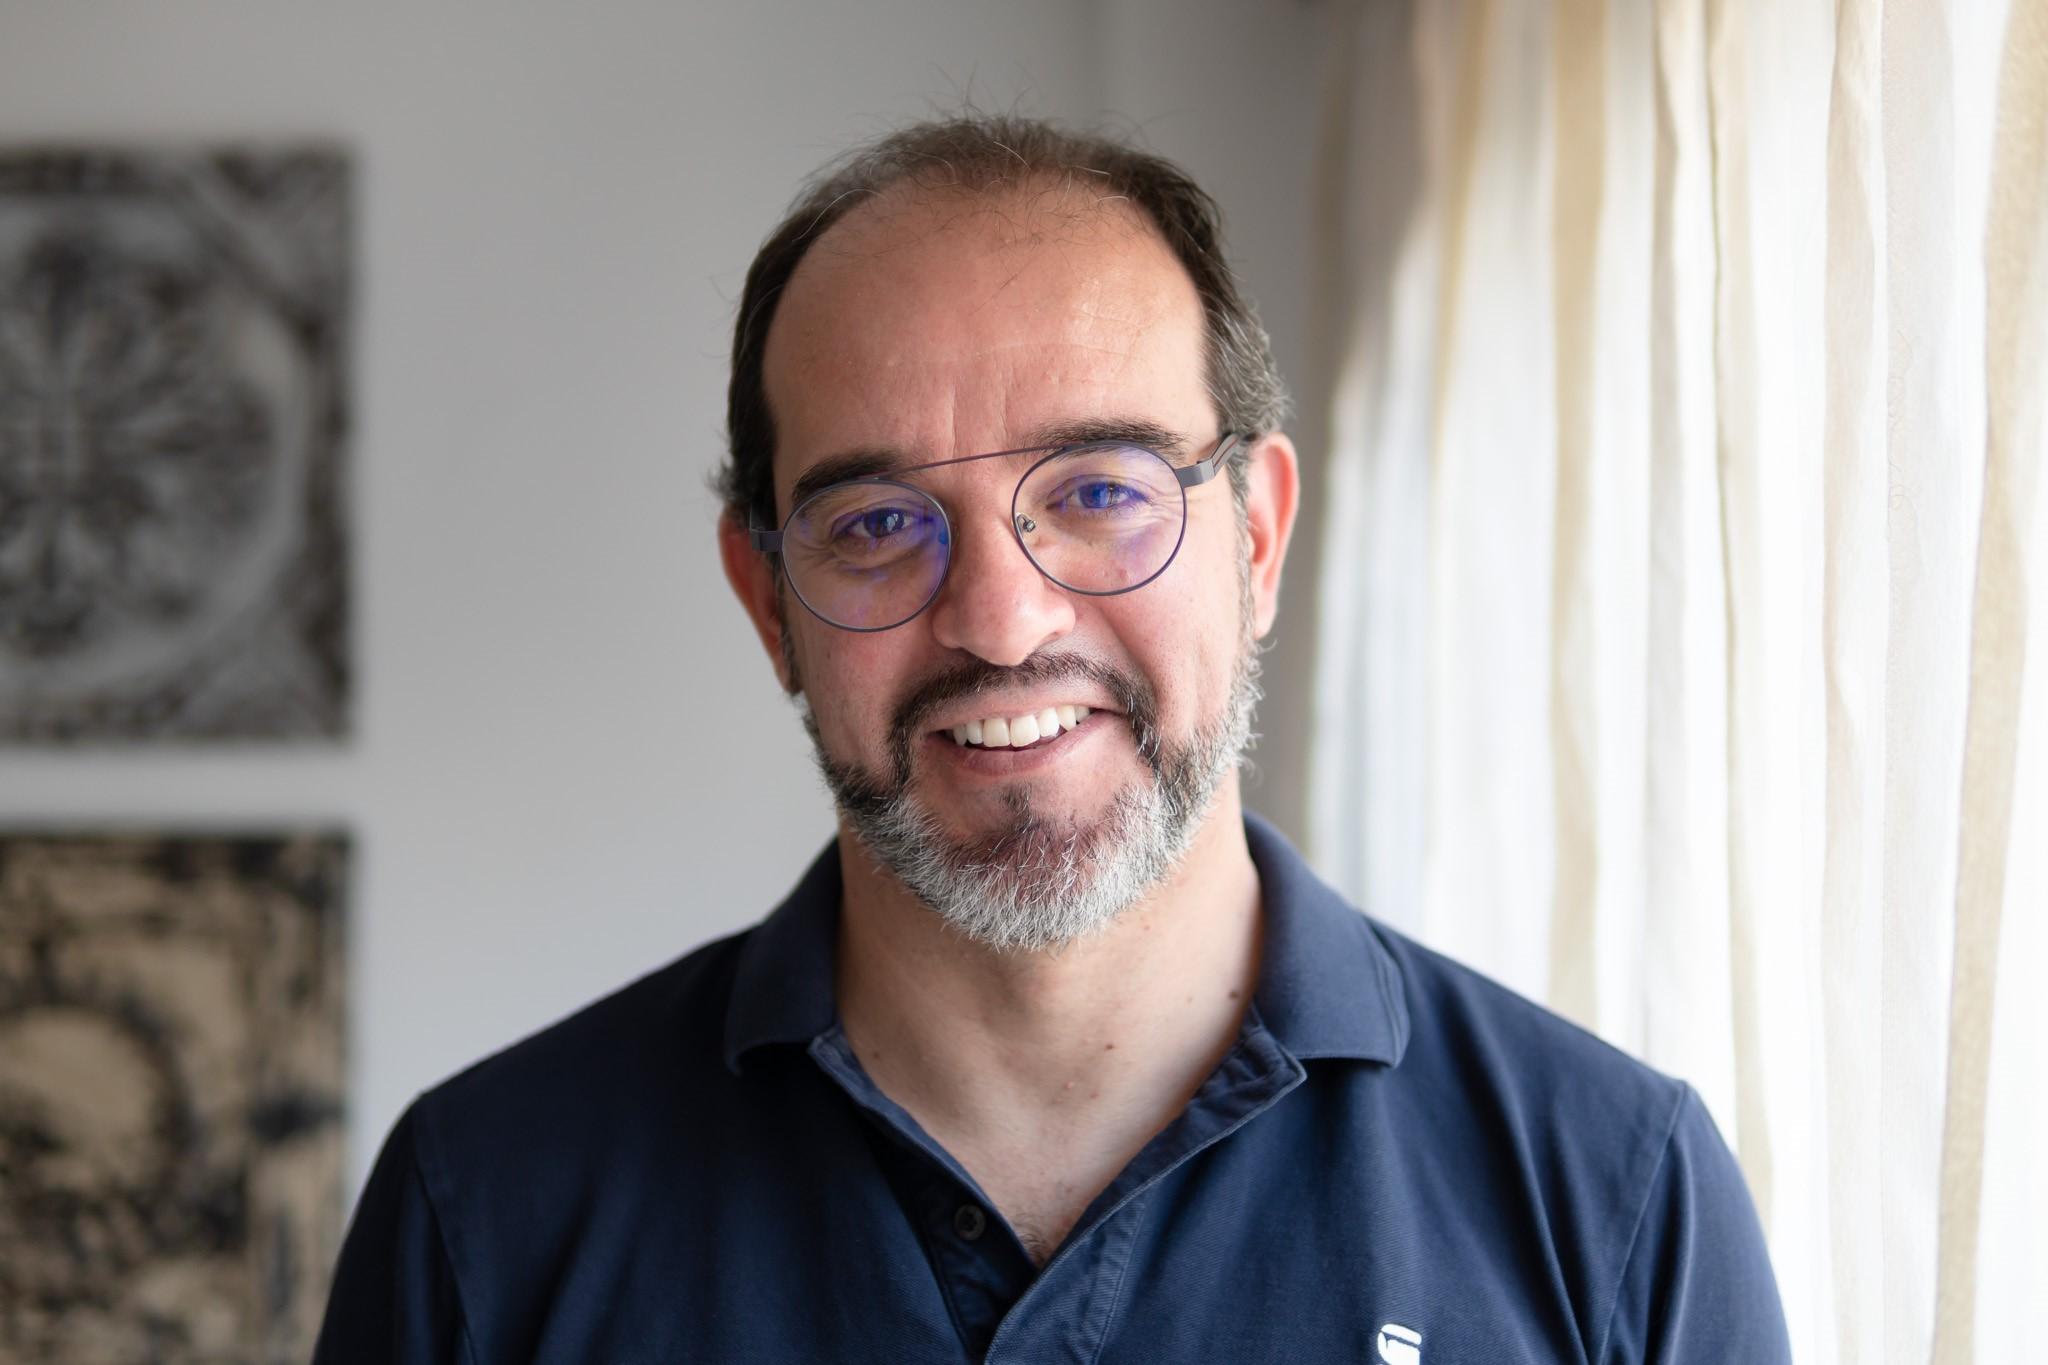 Humberto Matas